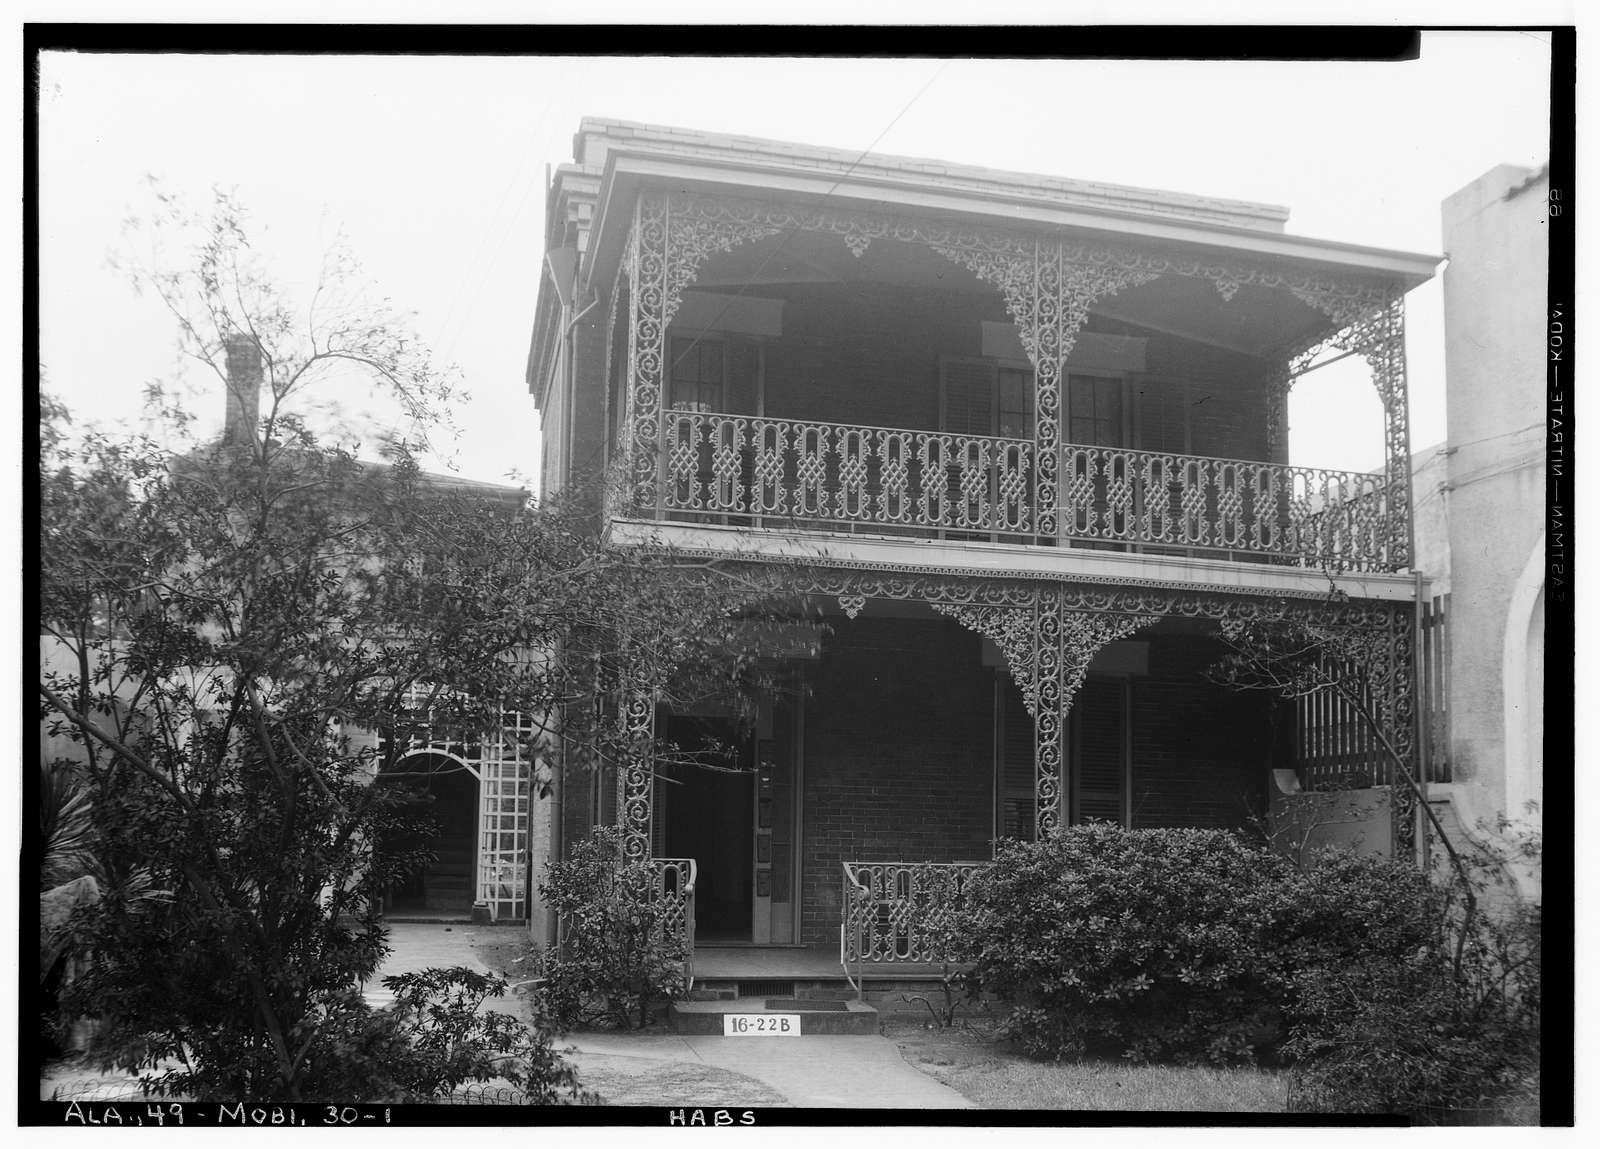 DuMont House, 157 Church Street, Mobile, Mobile County, AL